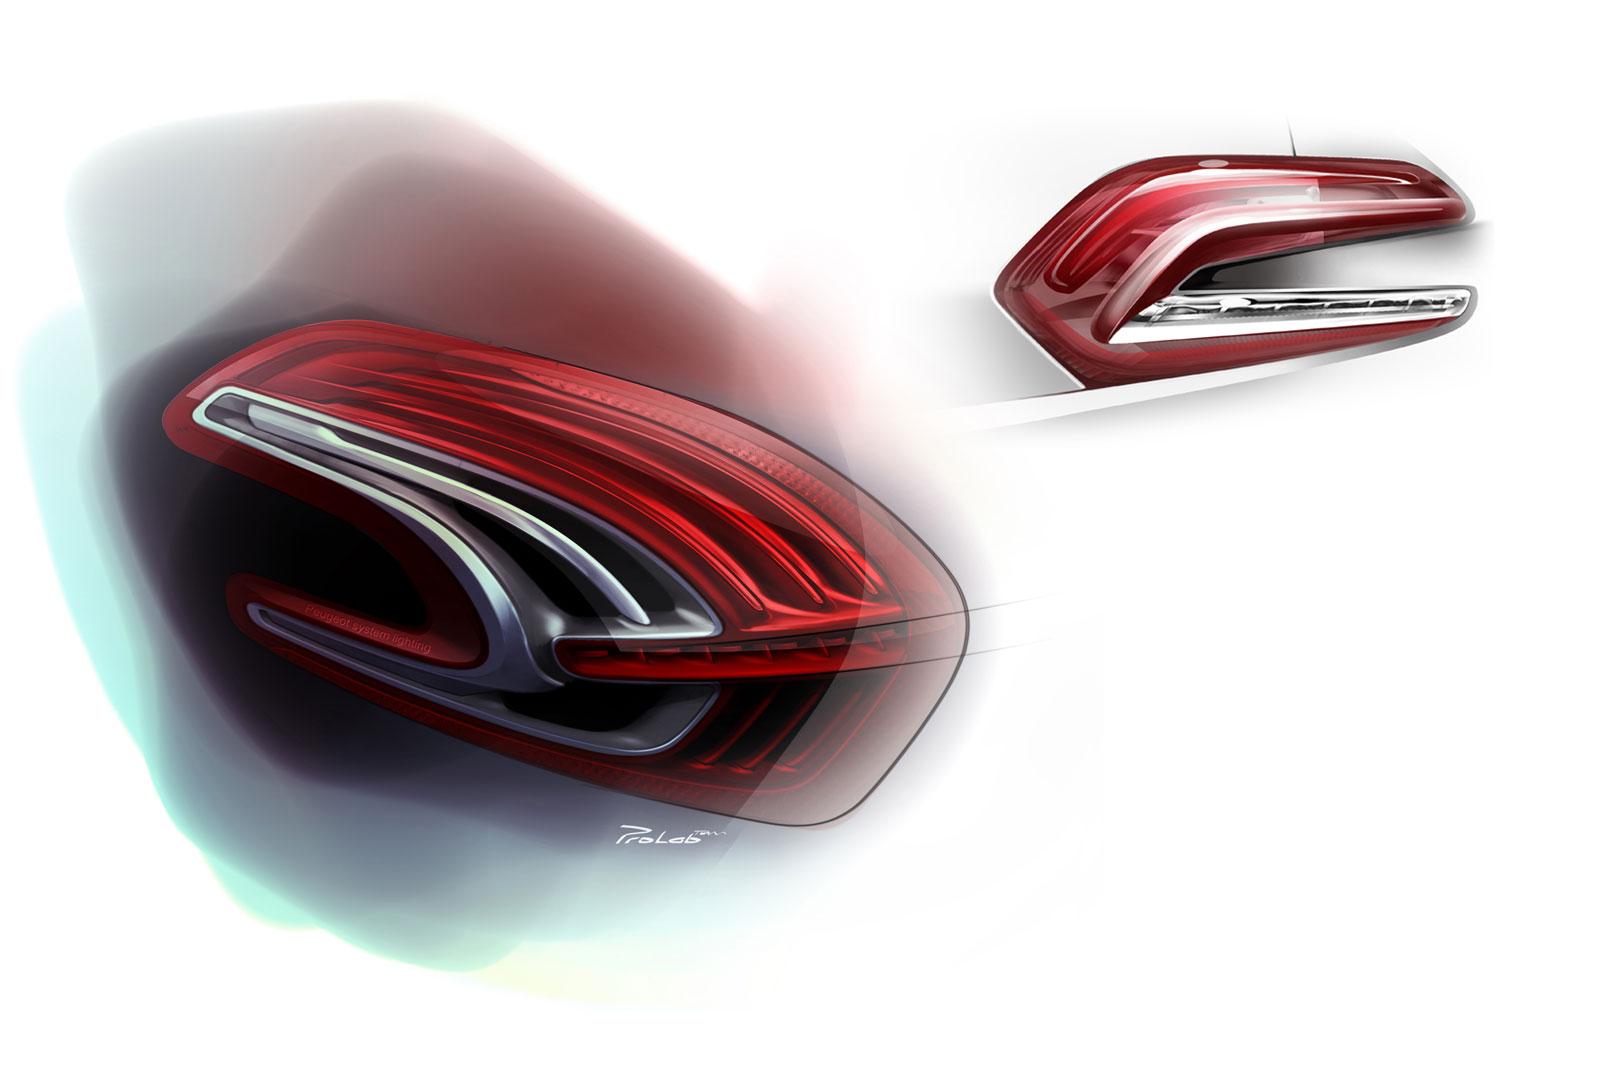 Peugeot 208 Tail Light Design Sketch Car Body Lights Wiring Diagram